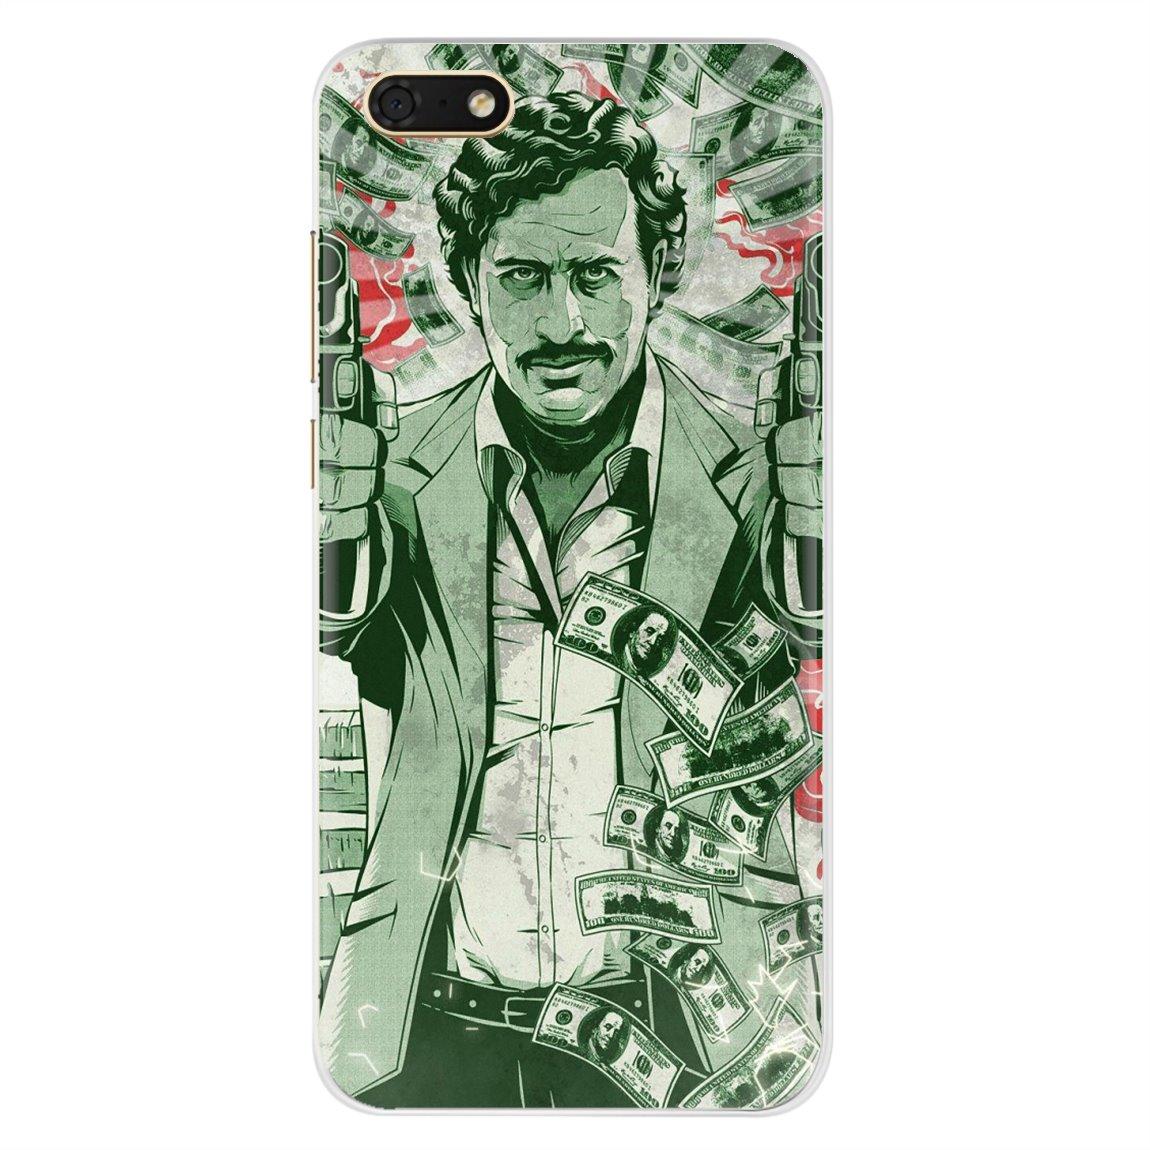 Personalizado caja del teléfono de silicona Pablo Escobar para iPhone 11 Pro 4 4S 5 5S SE 5C 6 6S 7 7 8 X XR XS Plus Max para iPod Touch